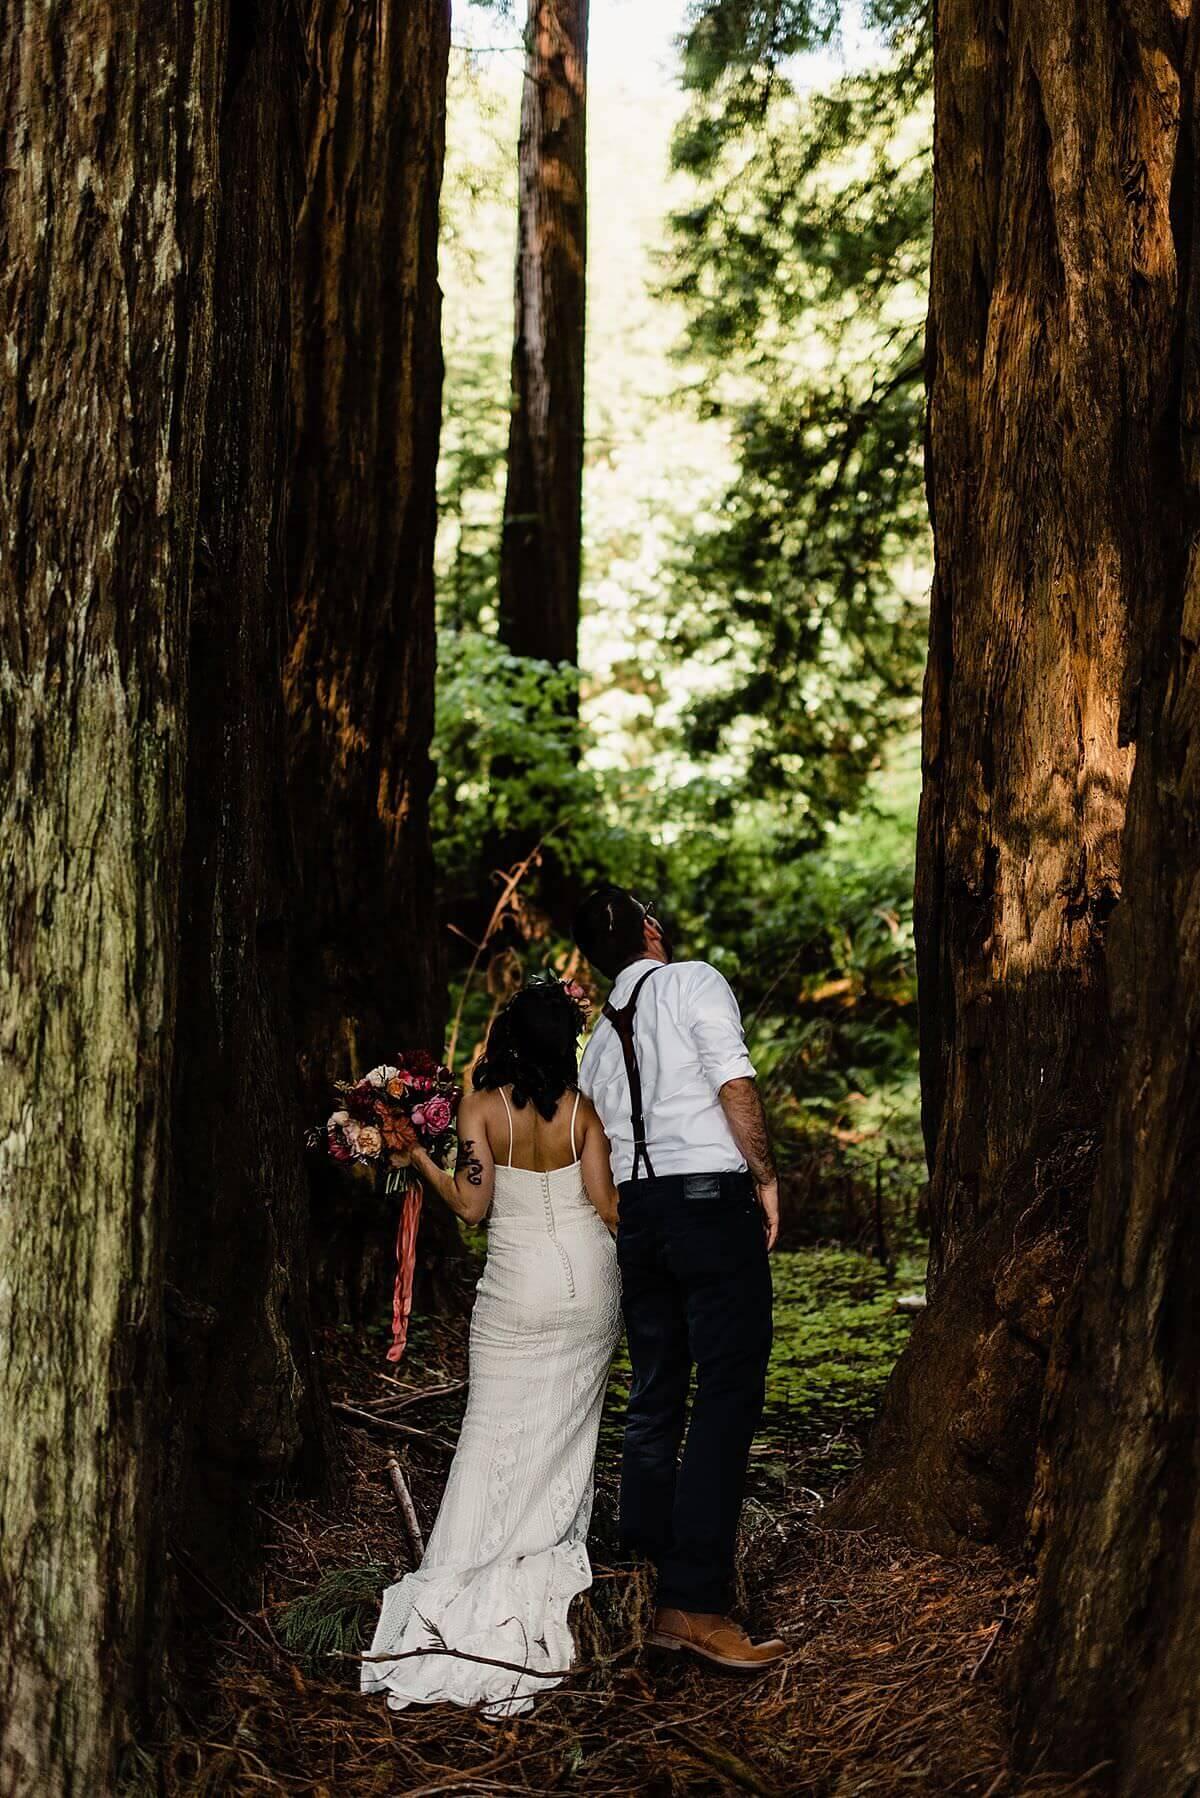 Allison-Brooks-Jedediah-Smiith-Redwoods-Adventure-Elopement-Wedding-S-Photography-Blog_0004.jpg